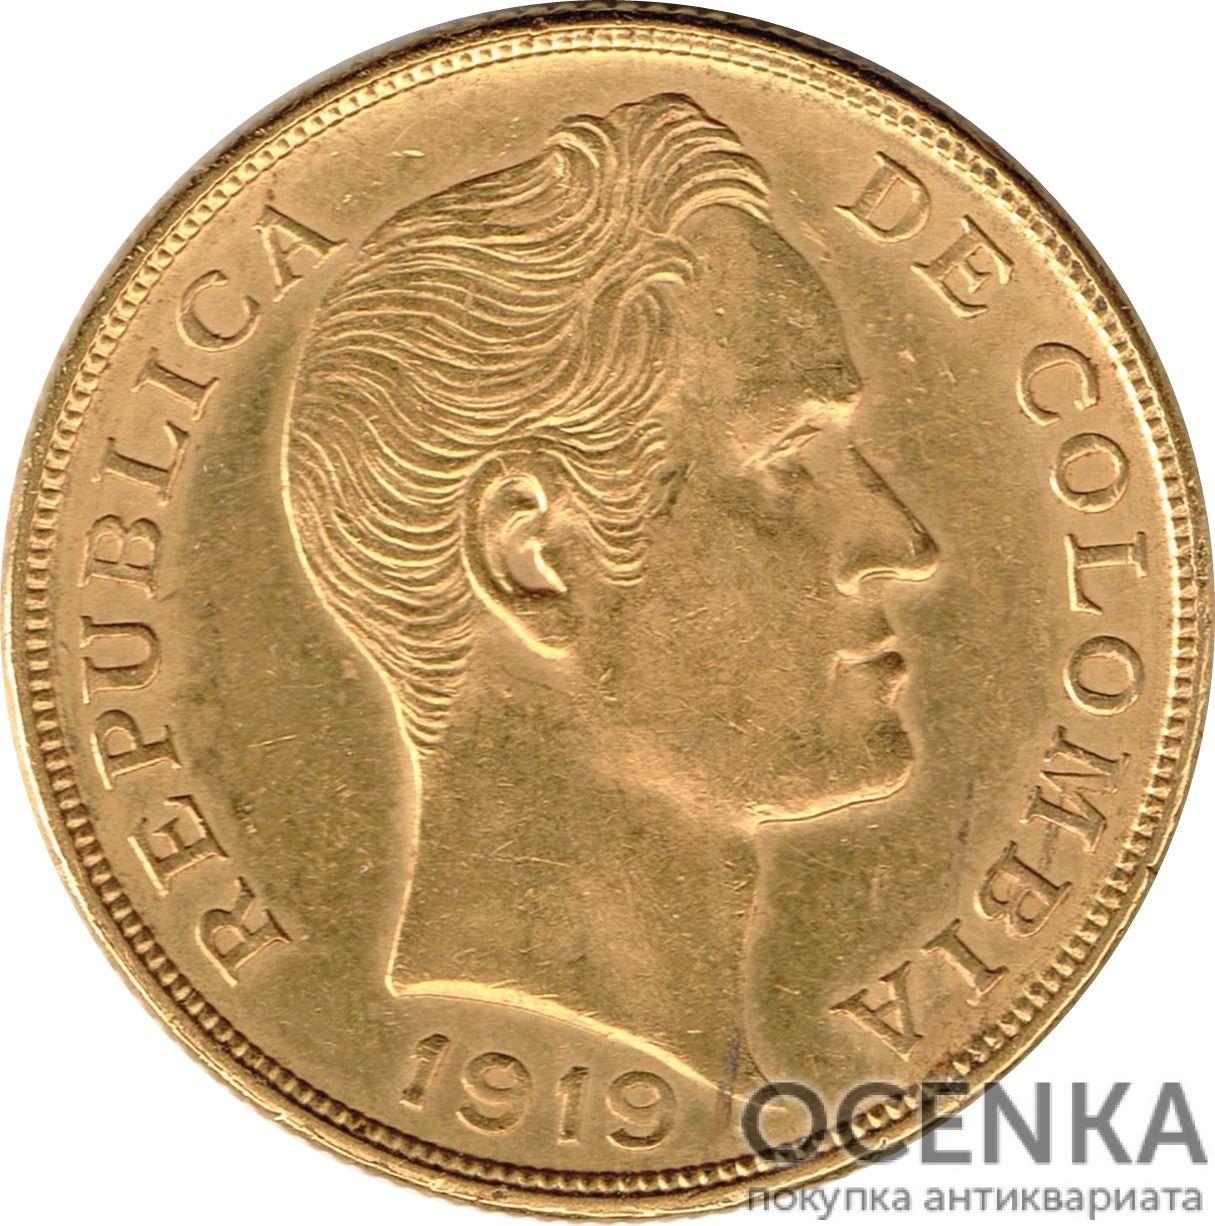 Золотая монета 10 Песо (10 Pesos) Колумбия - 3